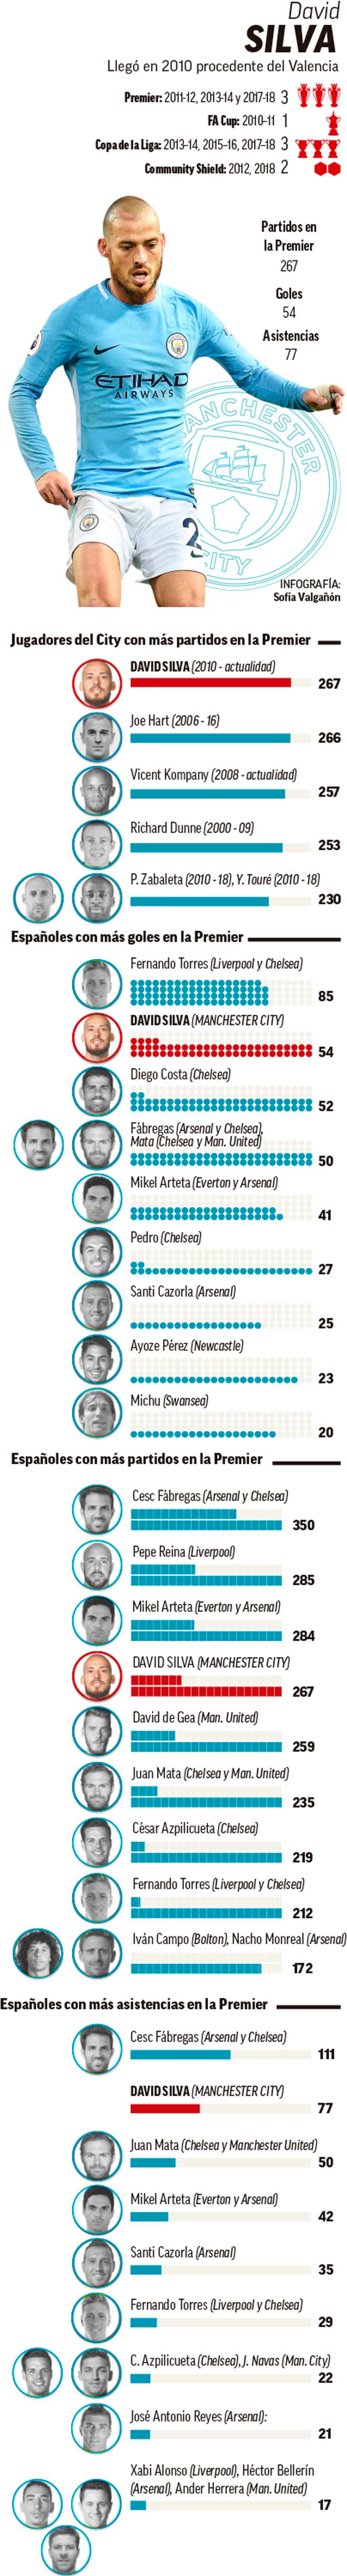 , David Silva's Premier League